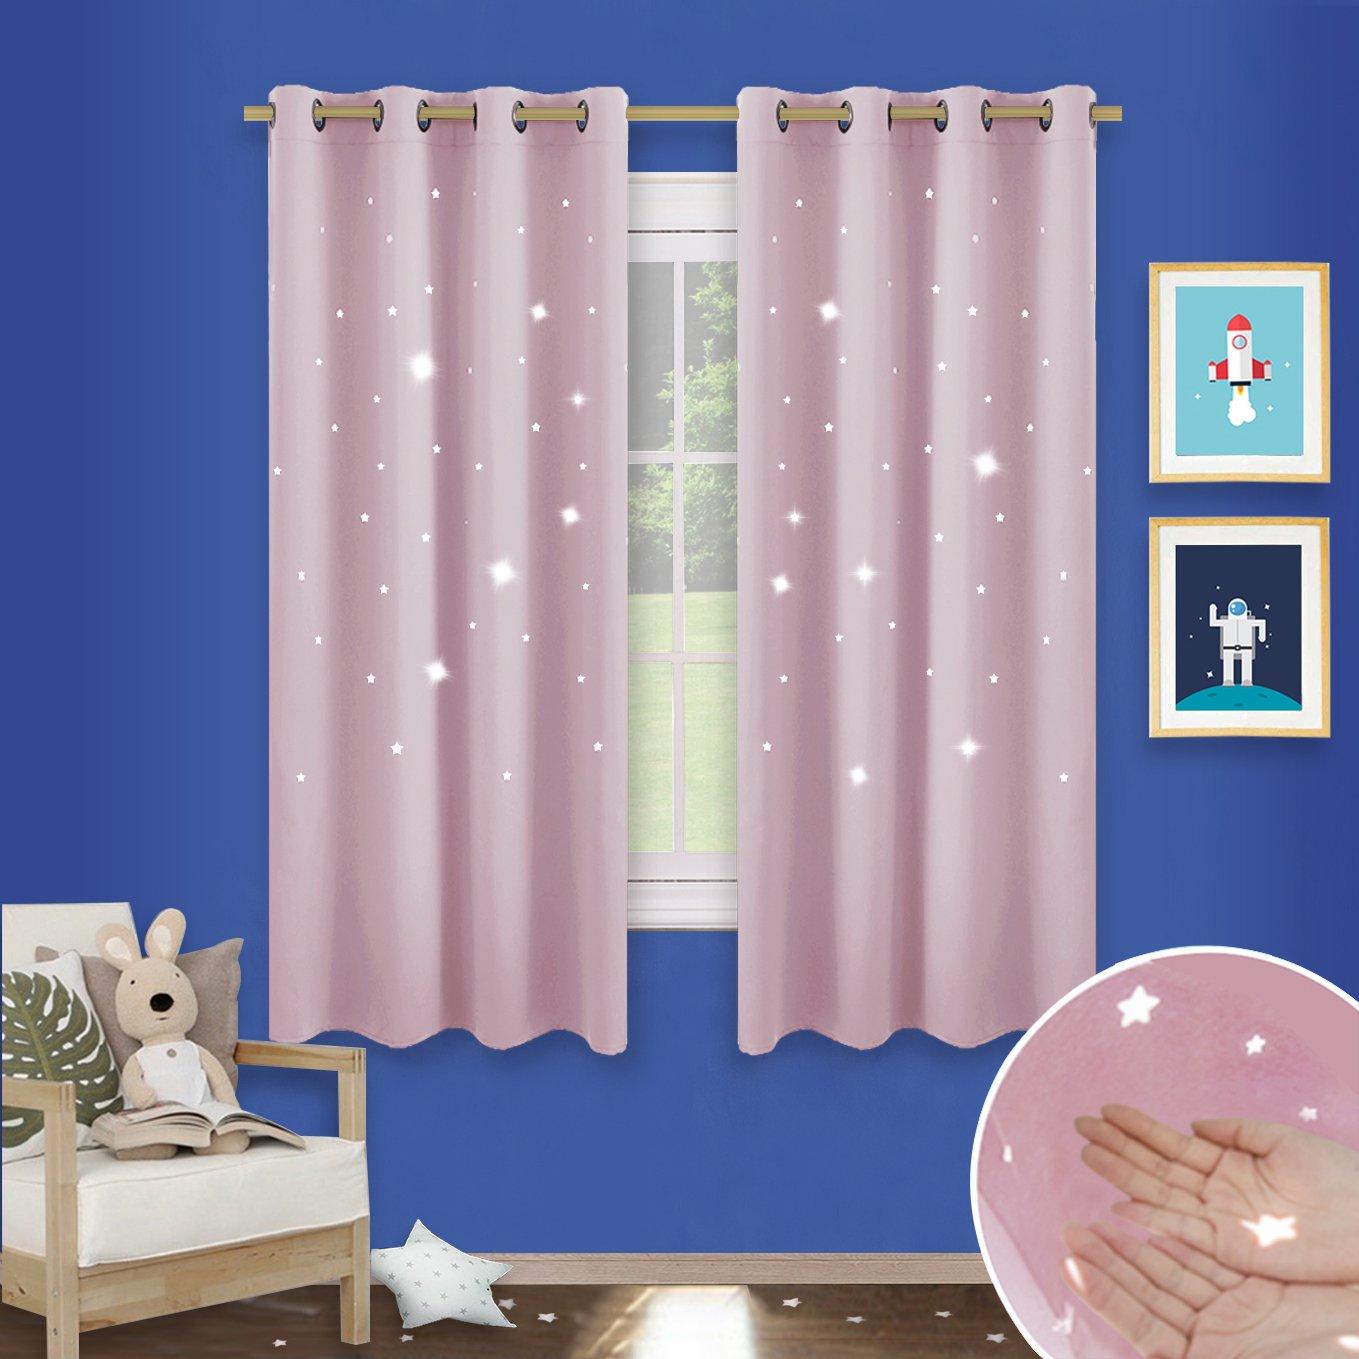 PONY DANCE Hollow Out Eyelet Star Curtains Night Sleep Cut Decor Twinkle Room Darkening